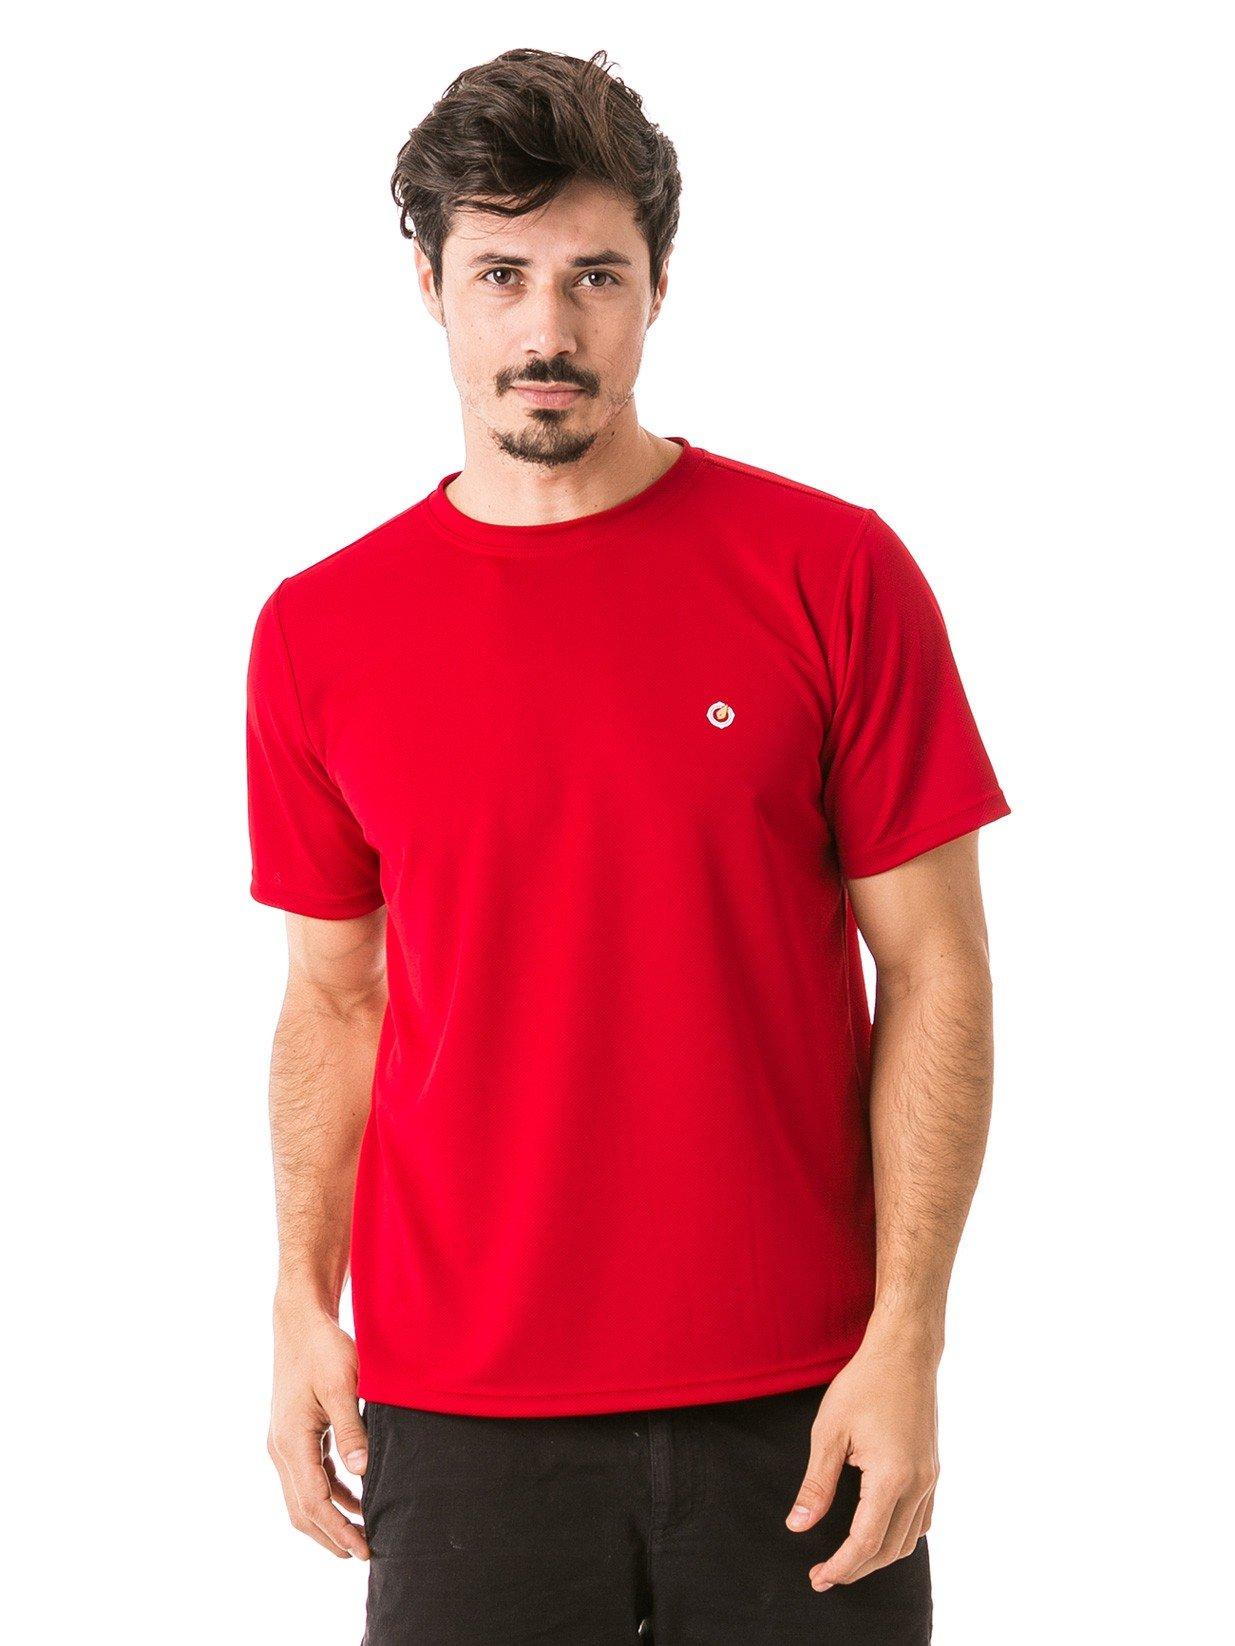 masculina t shirt curta dry vermelha frente 2 b